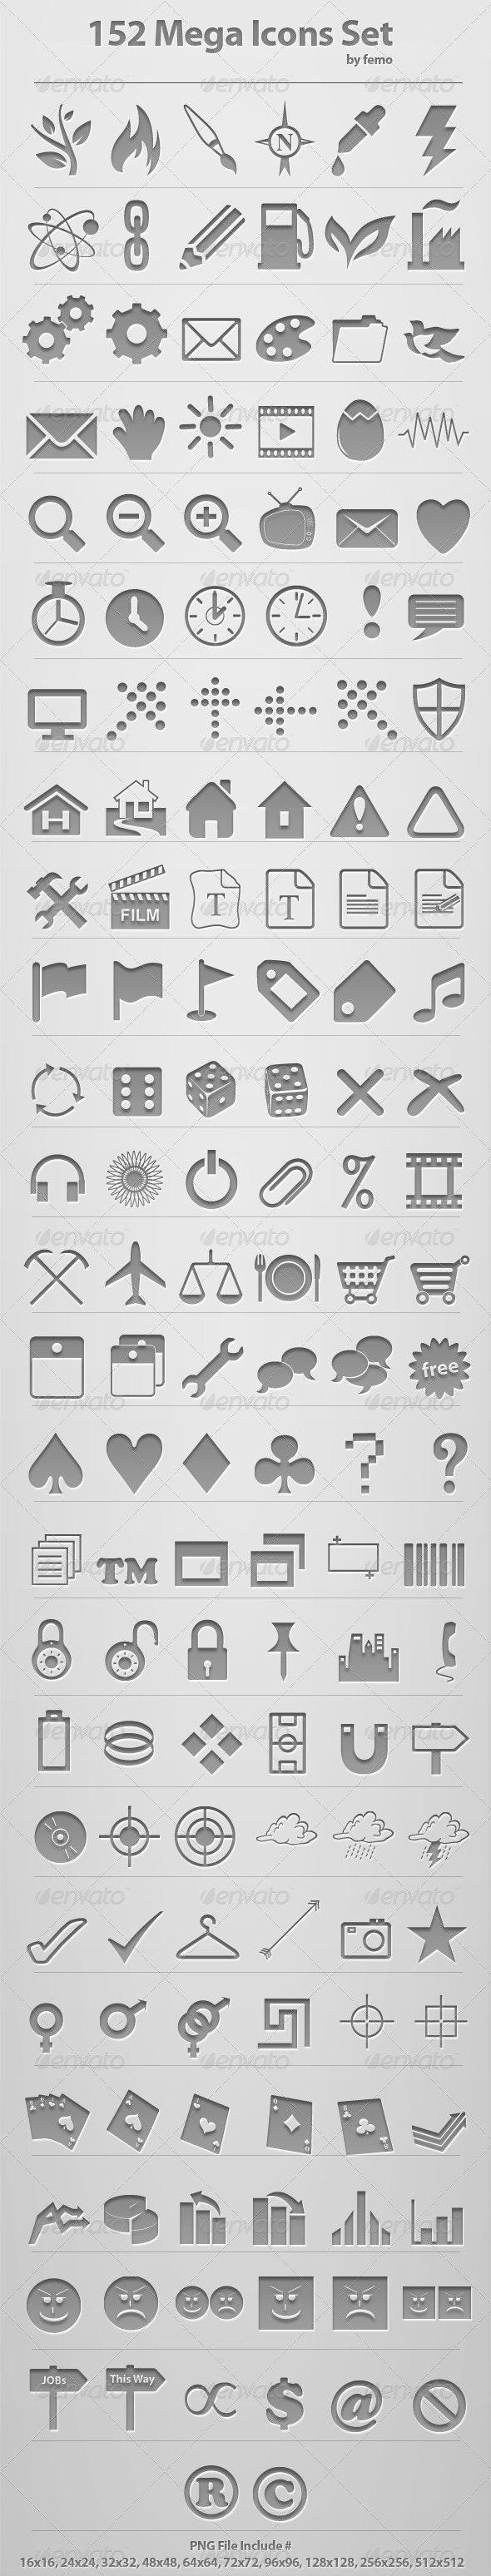 152 Mega Icons Set - Web Icons